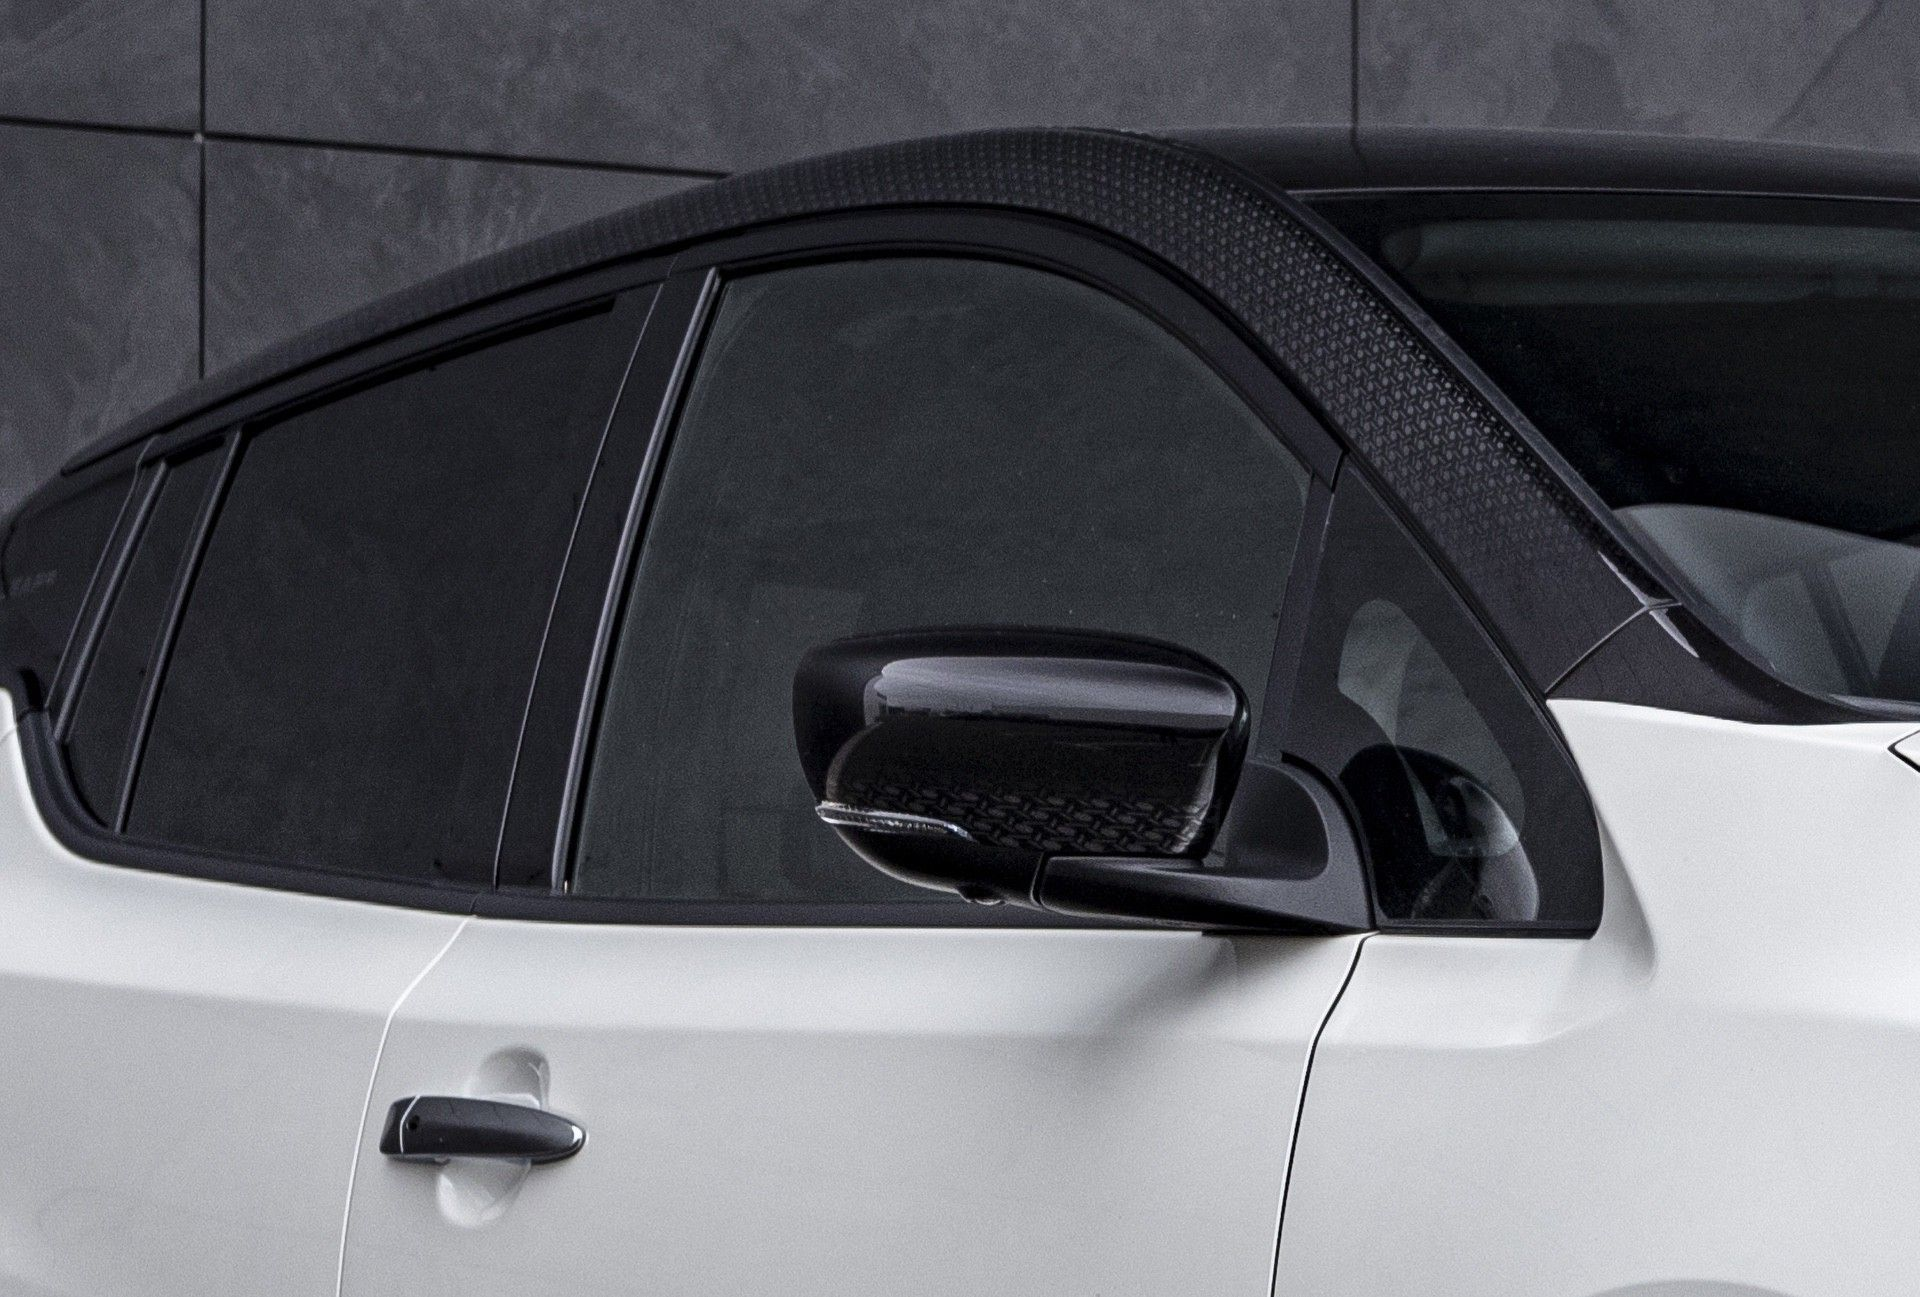 Nissan_Leaf10_special_edition-0005